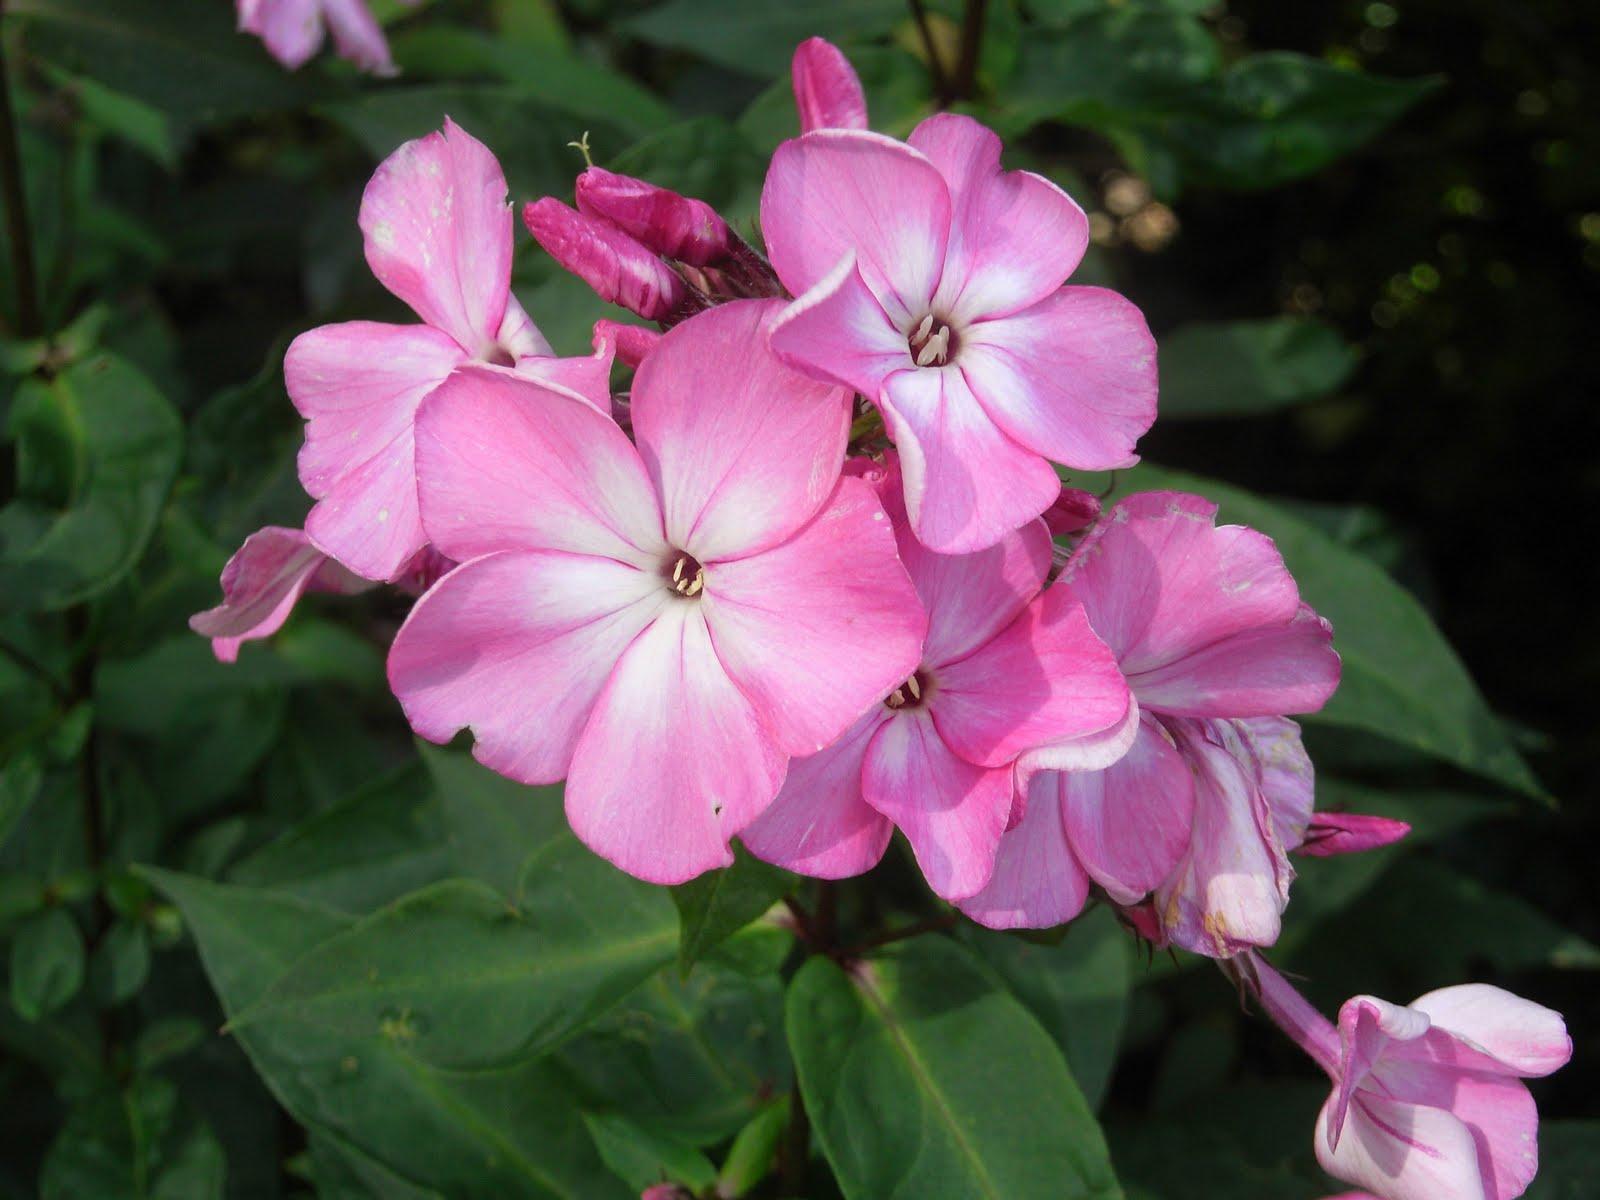 Что за цветок похожий на флокс